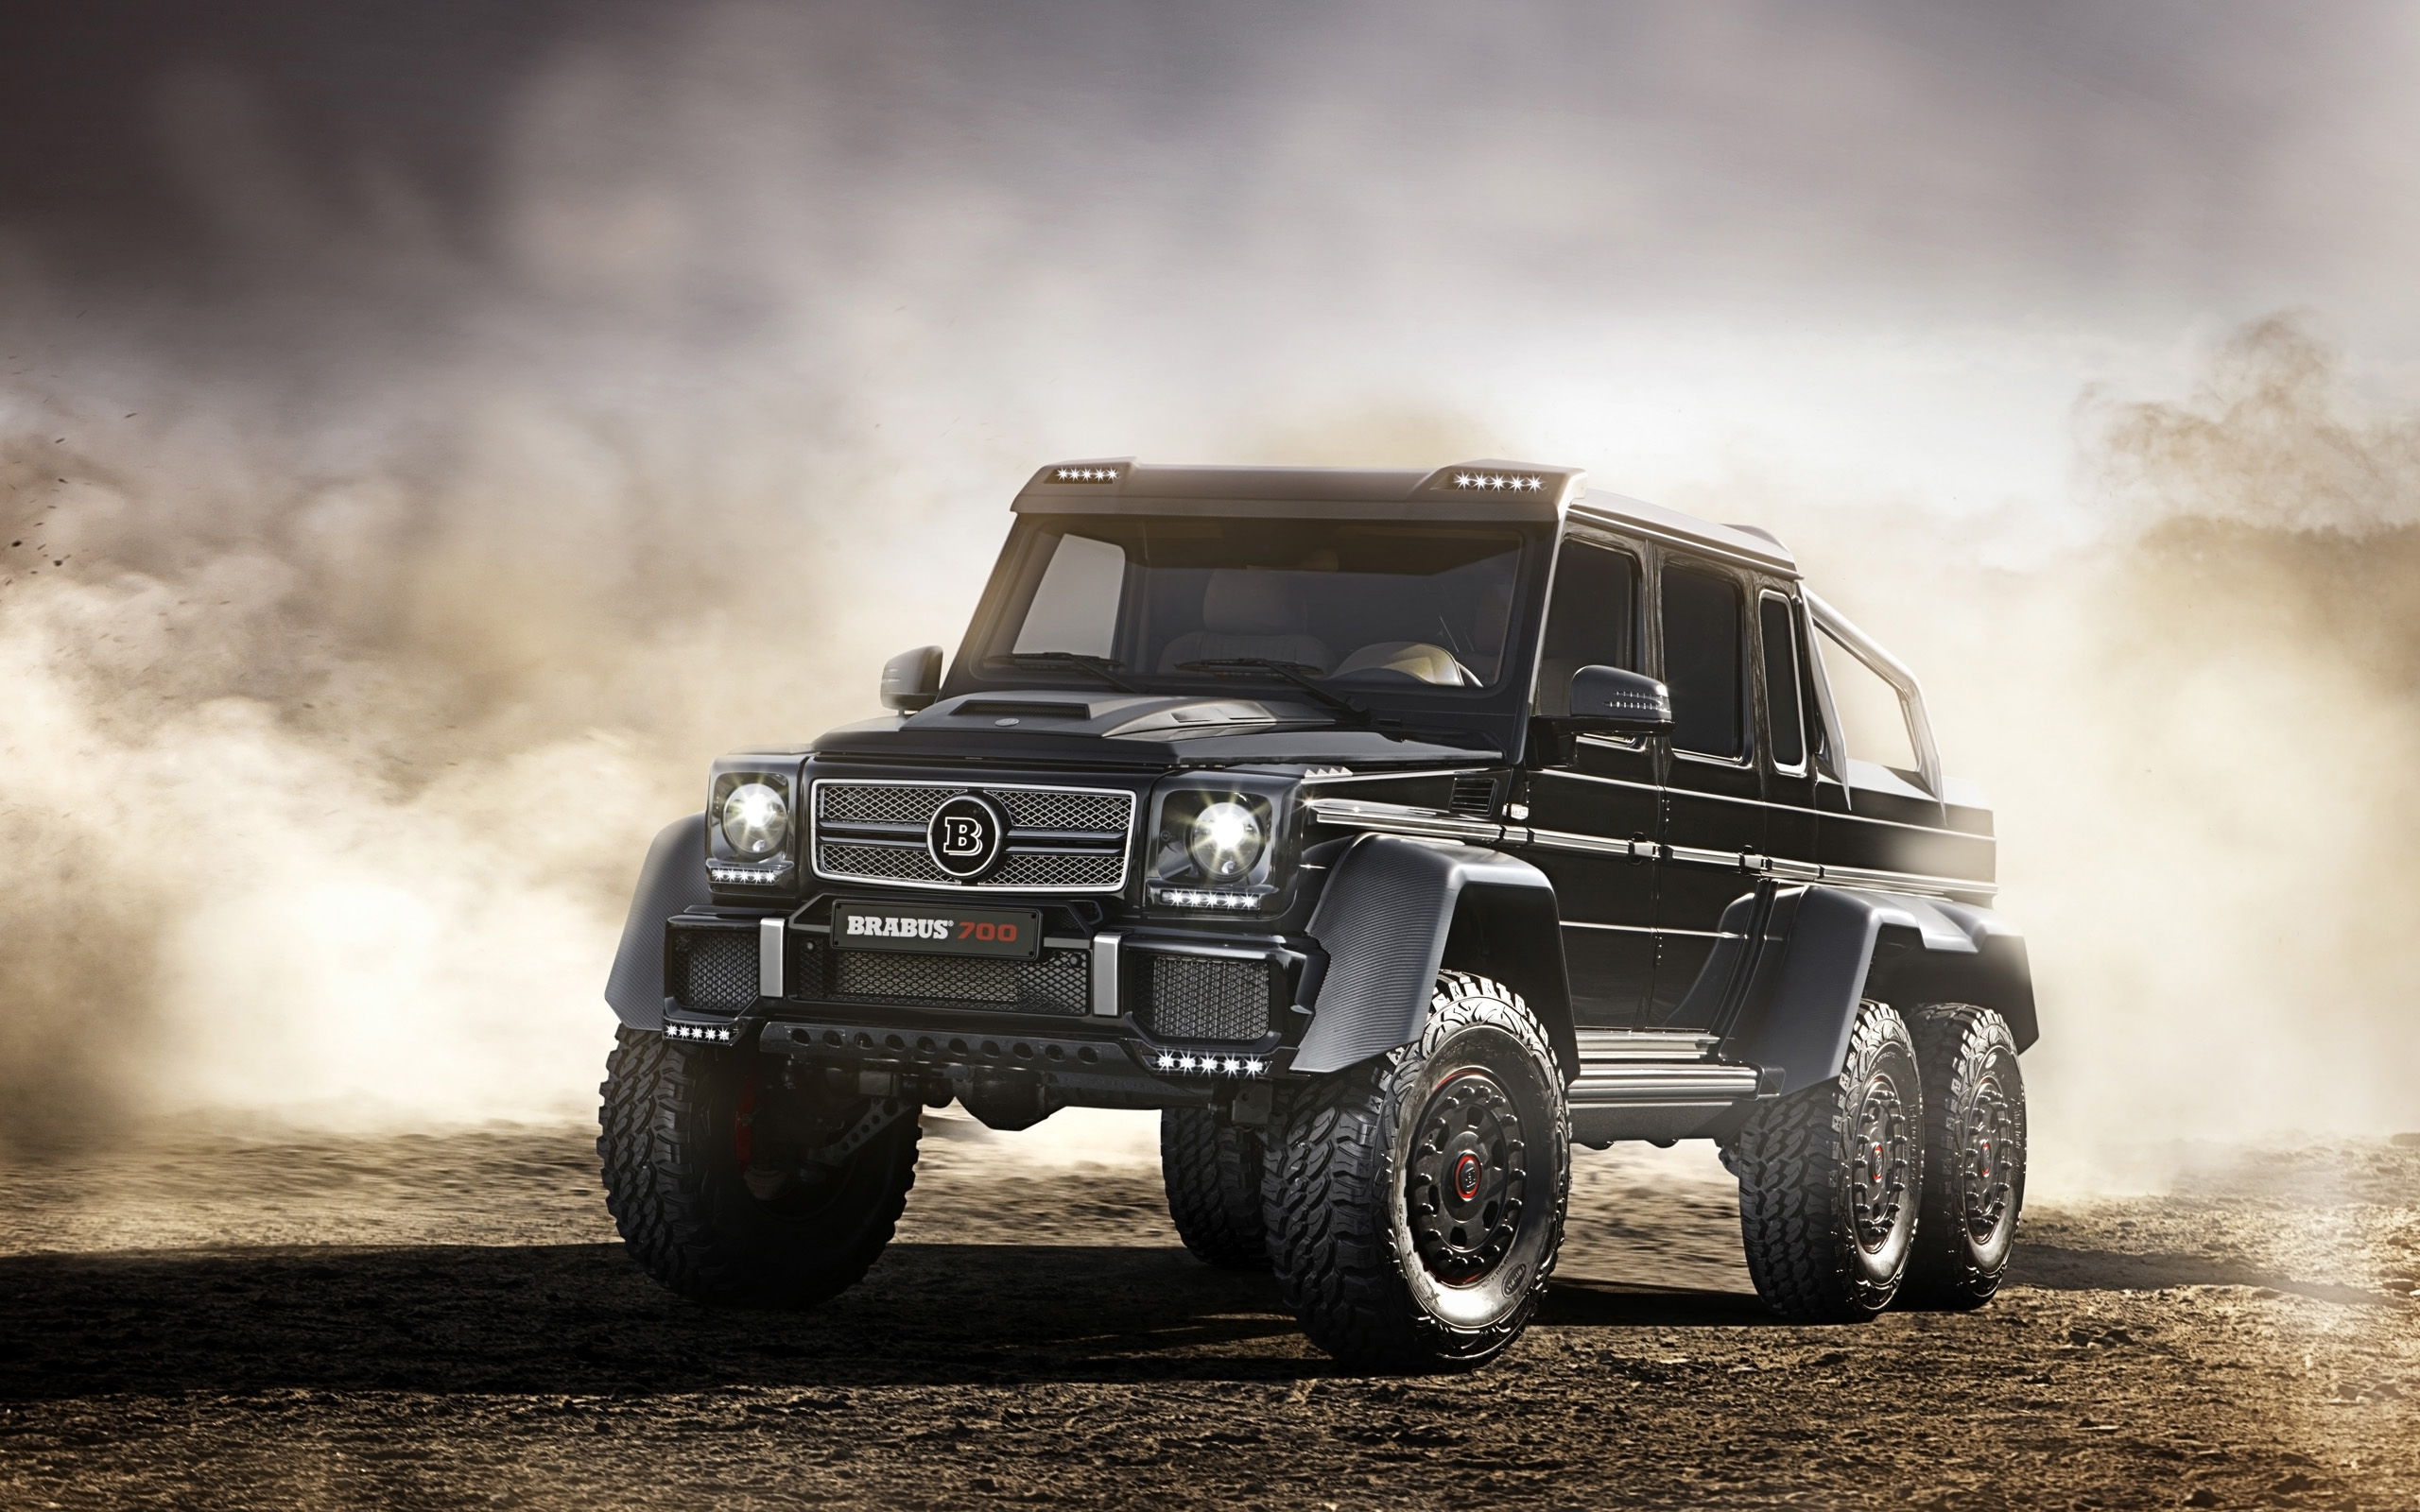 2014 Brabus Mercedes Benz B63s 700 6x6 Wallpaper Hd Car Wallpapers Id 4271